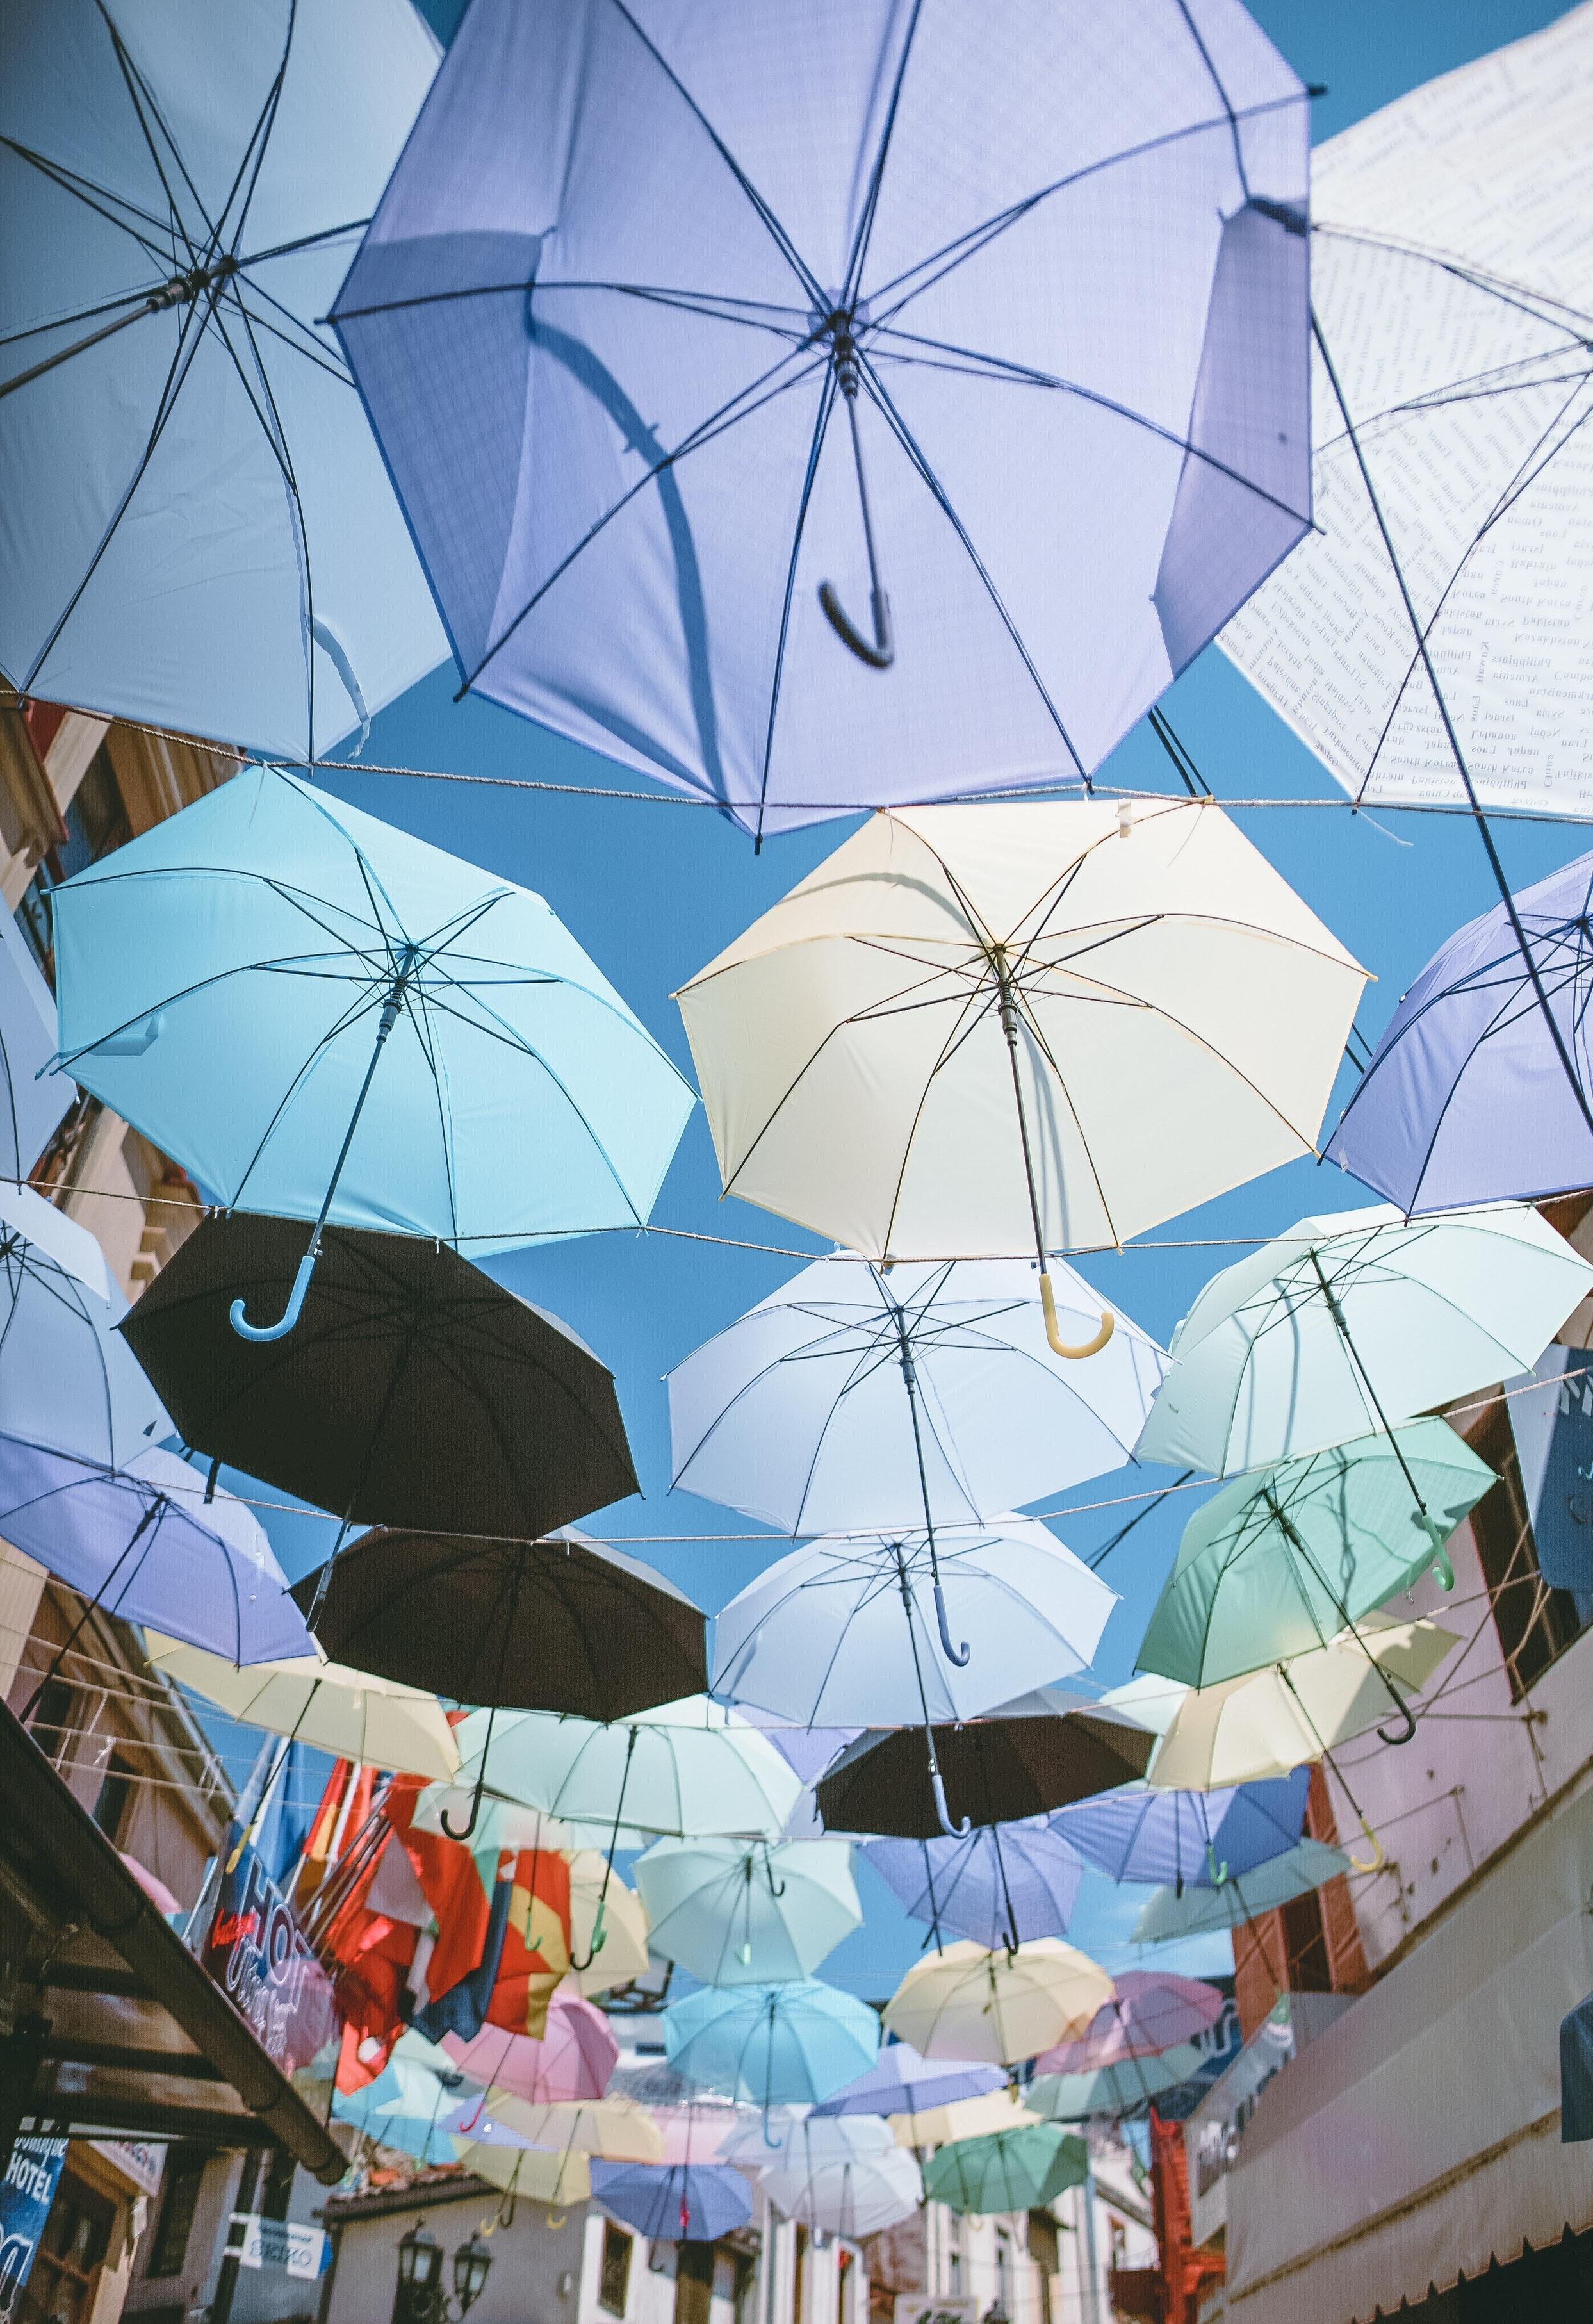 Regenschirm symbolbild postdoc stipendium.93234adb3f310966af9af1fc04e48cb23